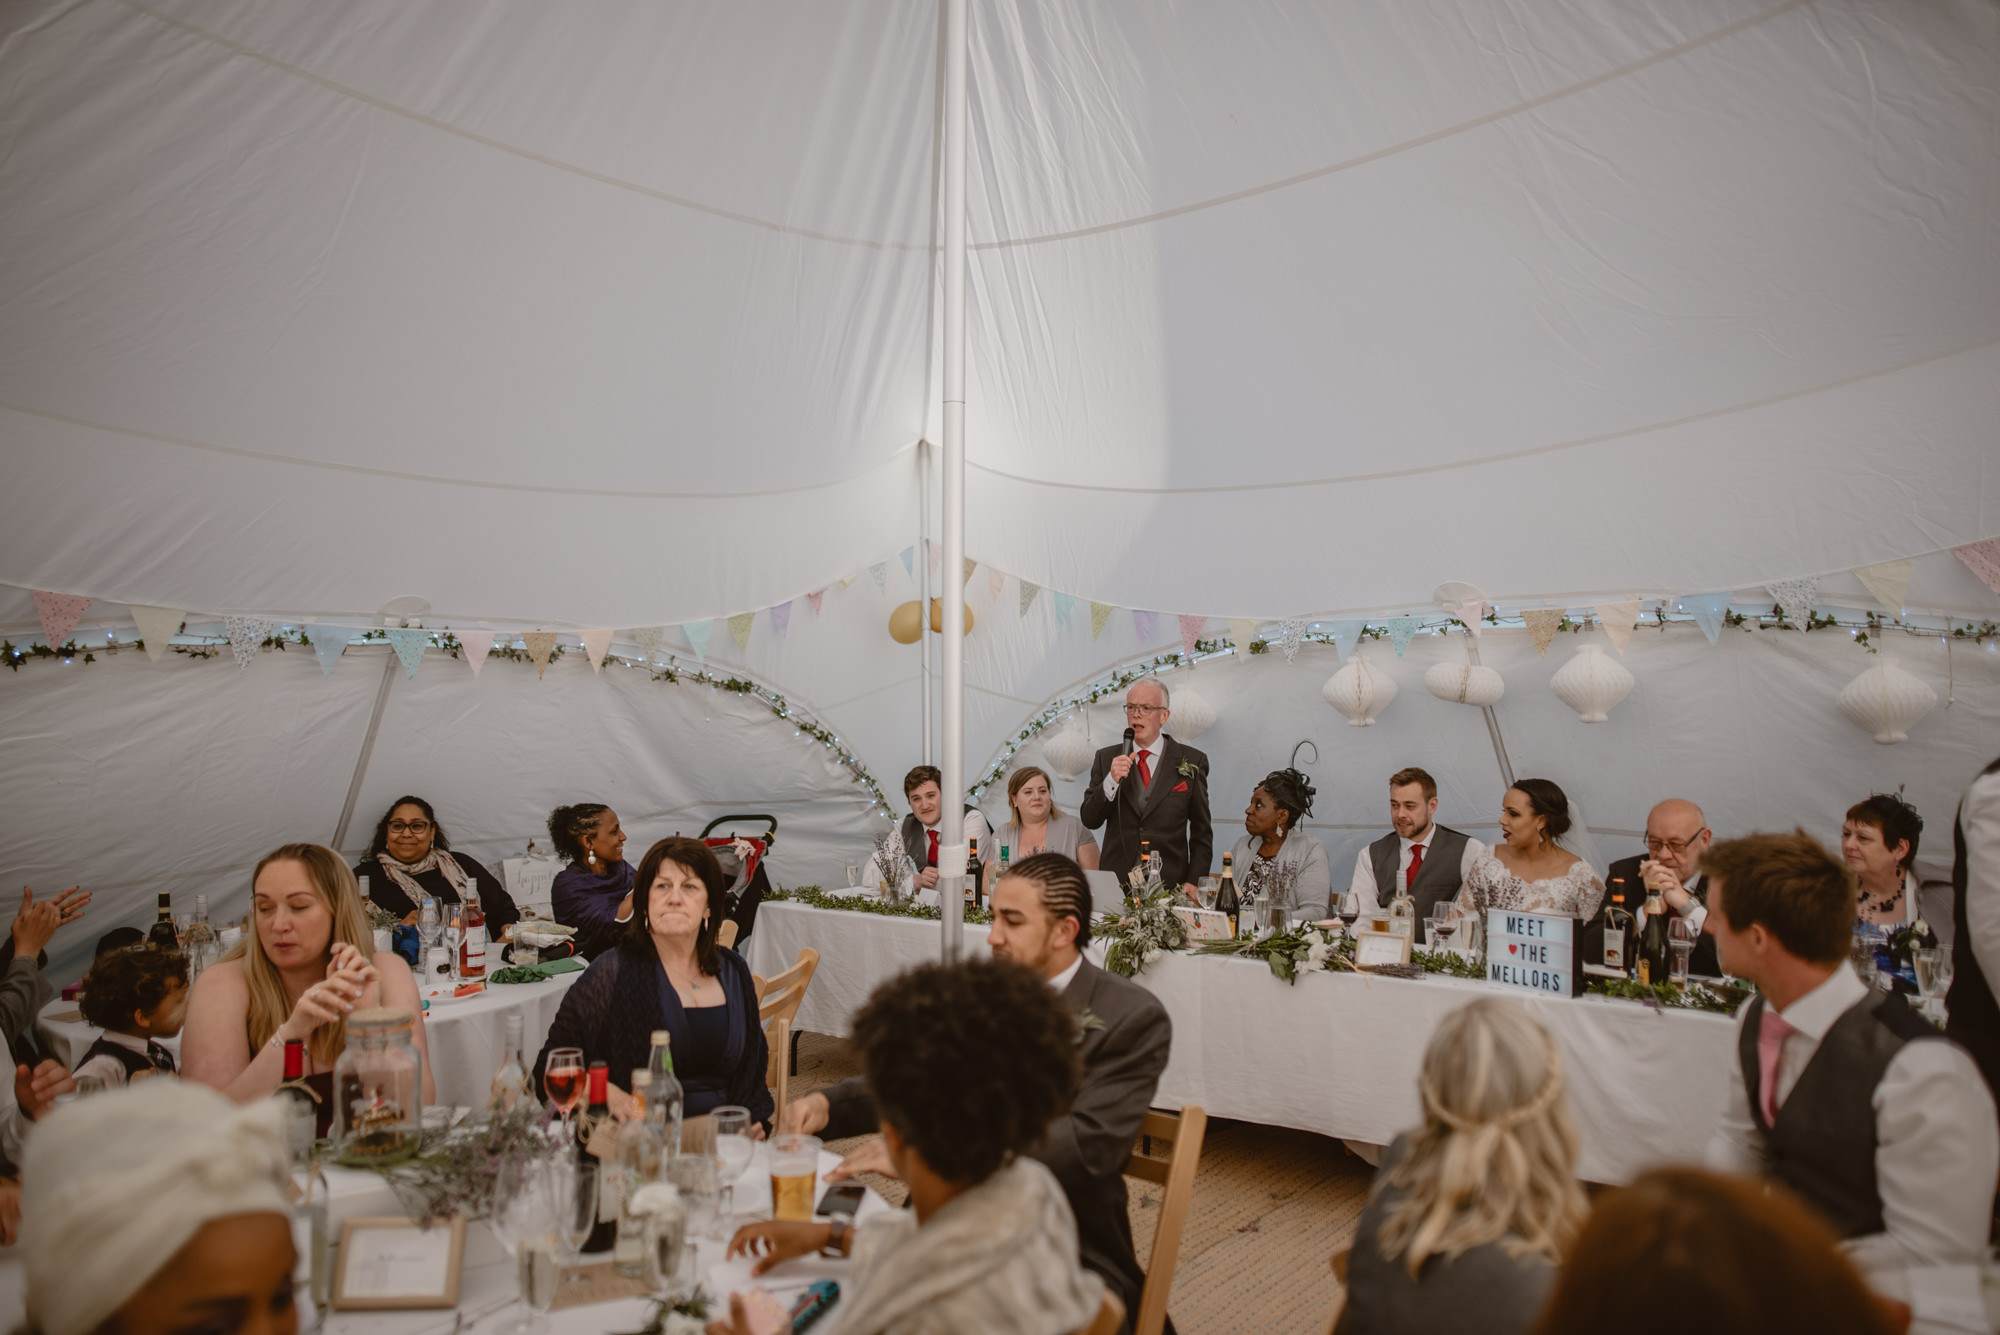 Jacqueline-Gareth-Wedding-Westmead-Events-Surrey-Manu-Mendoza-Wedding-Photography-388.jpg